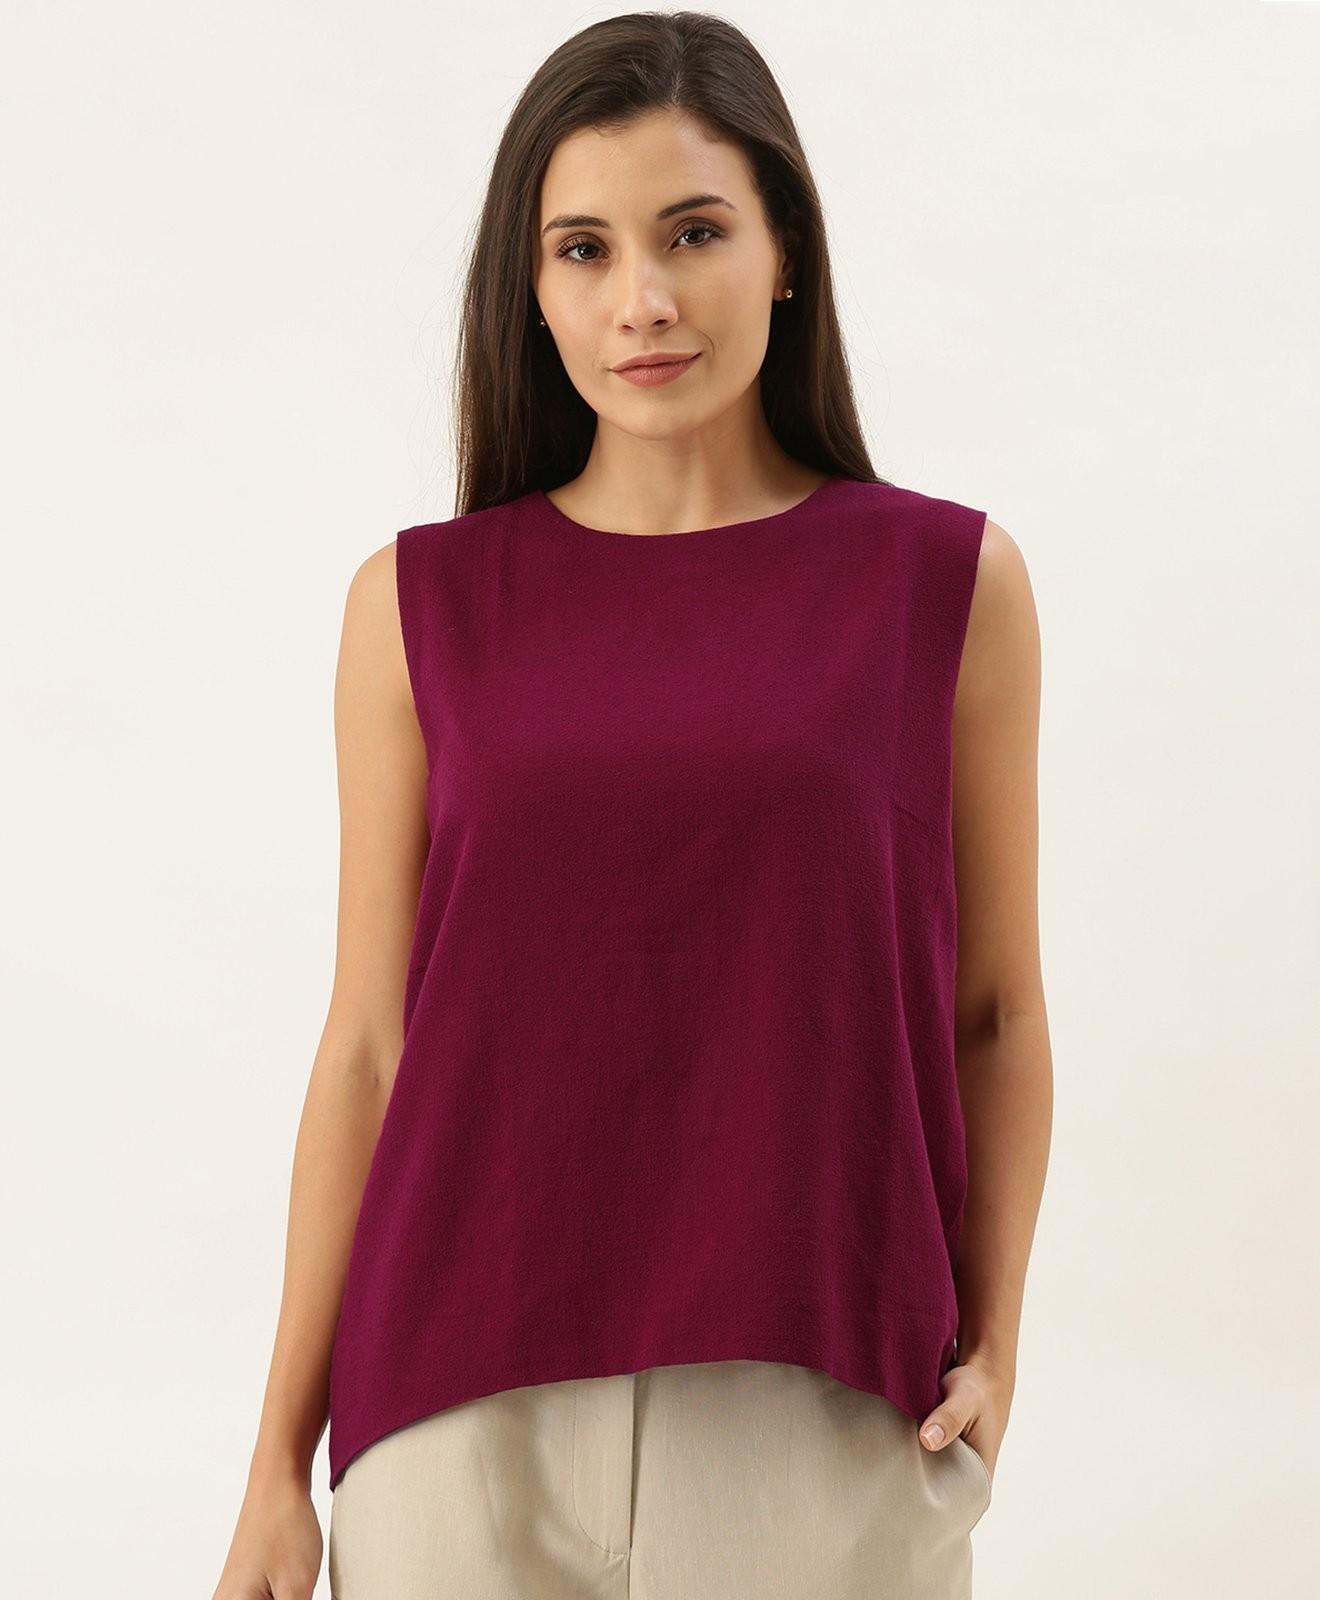 Summer cotton dresses for ladies